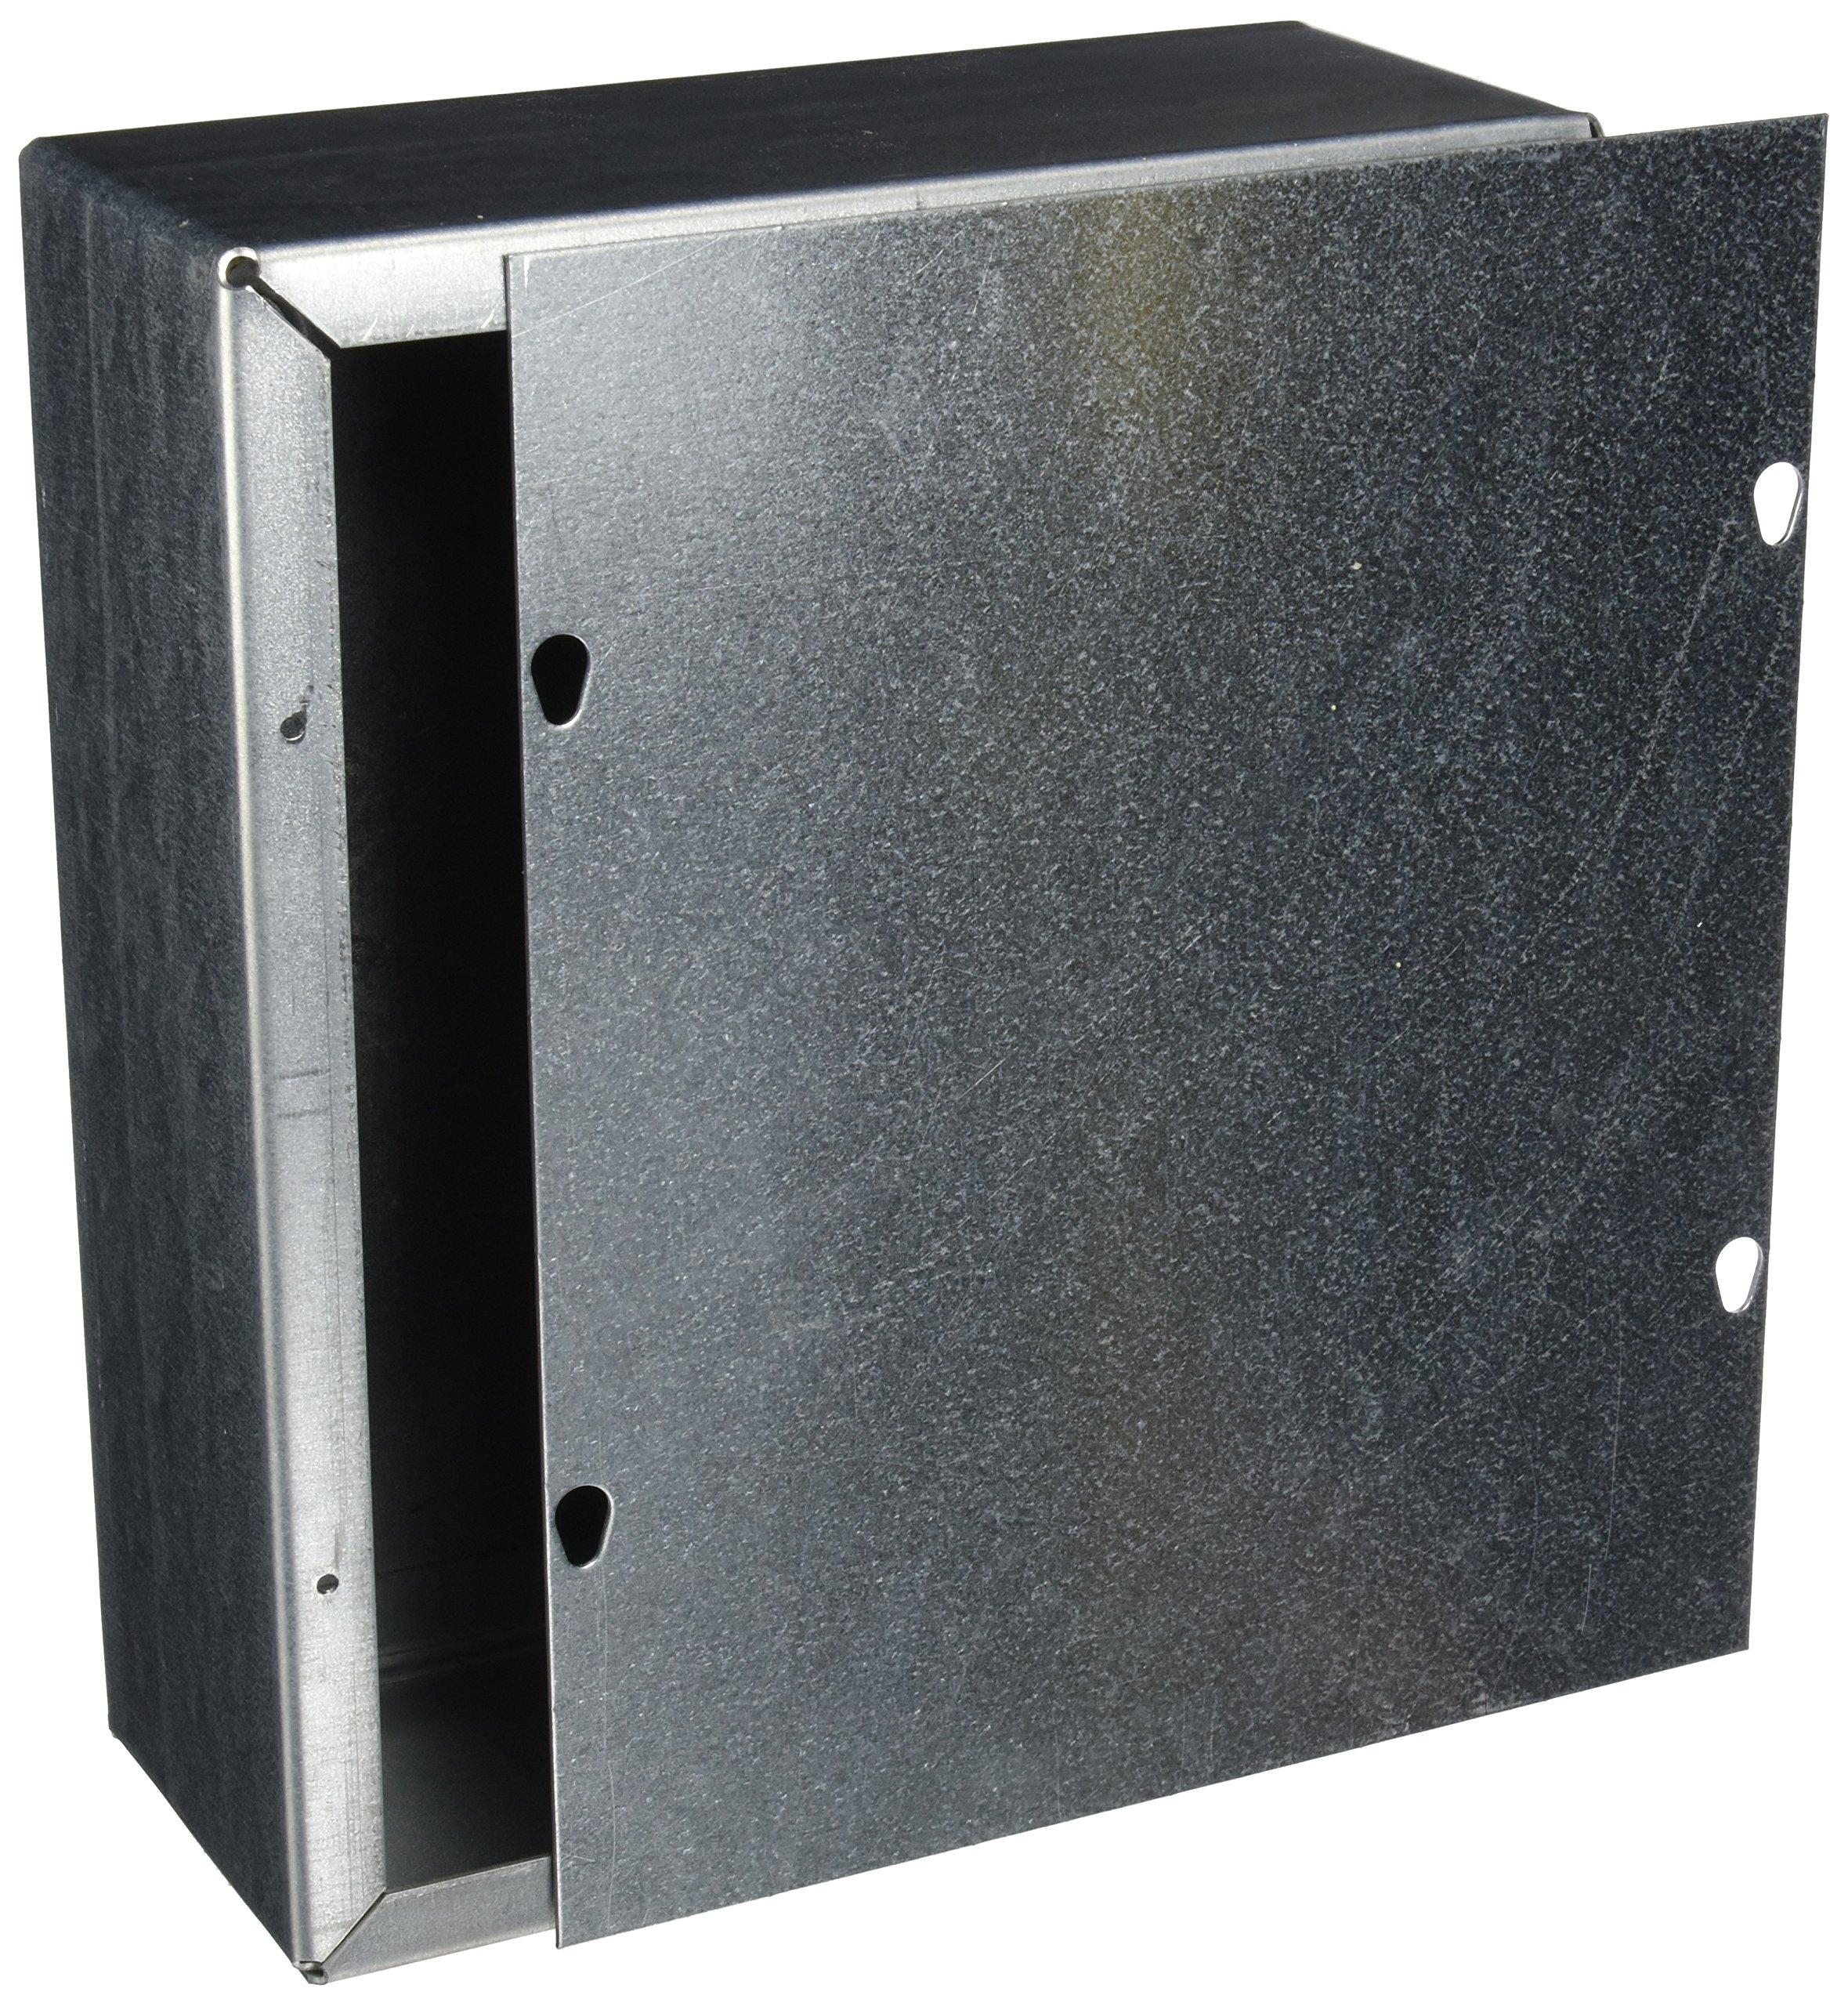 Wiegmann SC101204GNK SC-Series NEMA 1 Screw Cover Wallmount Pull Box, No Knockouts, Galvanized Steel, 12'' x 10'' x 4''